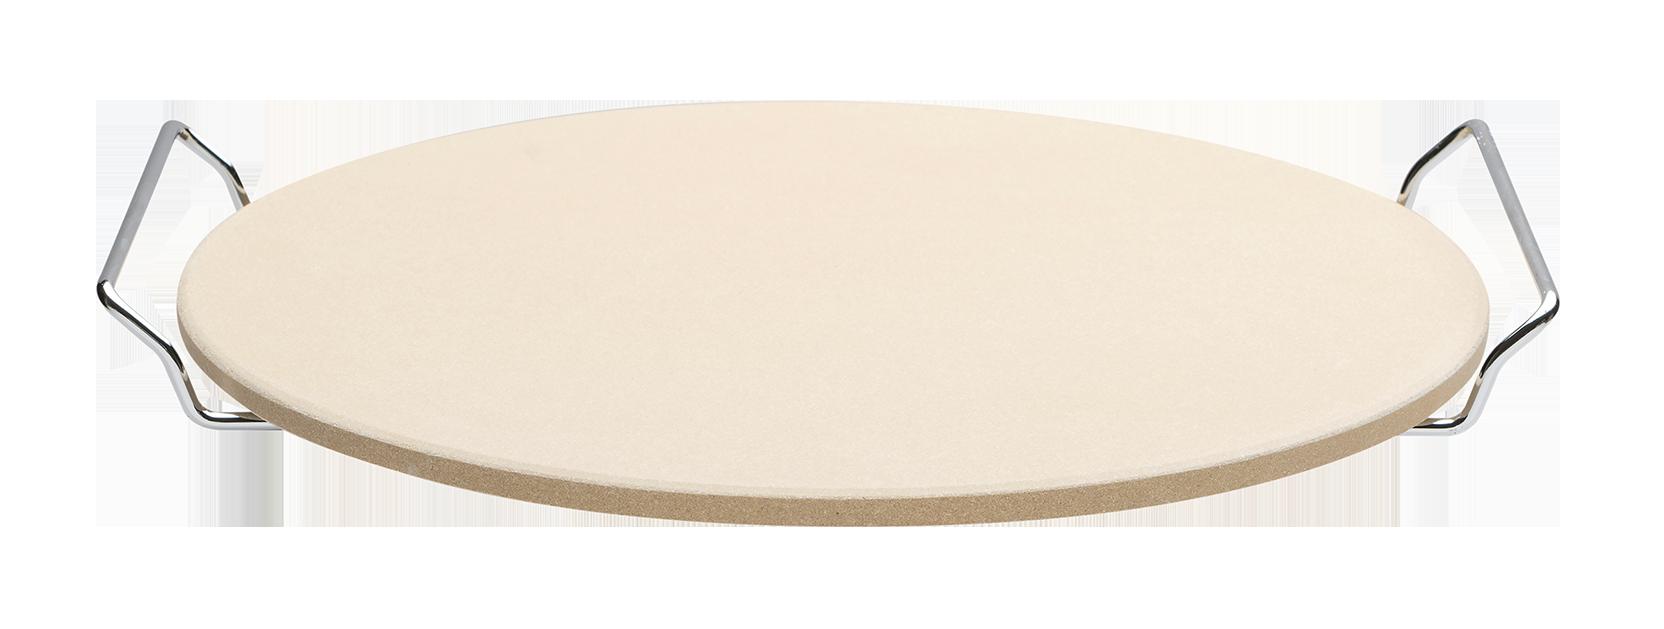 Pizzasteen 33cm